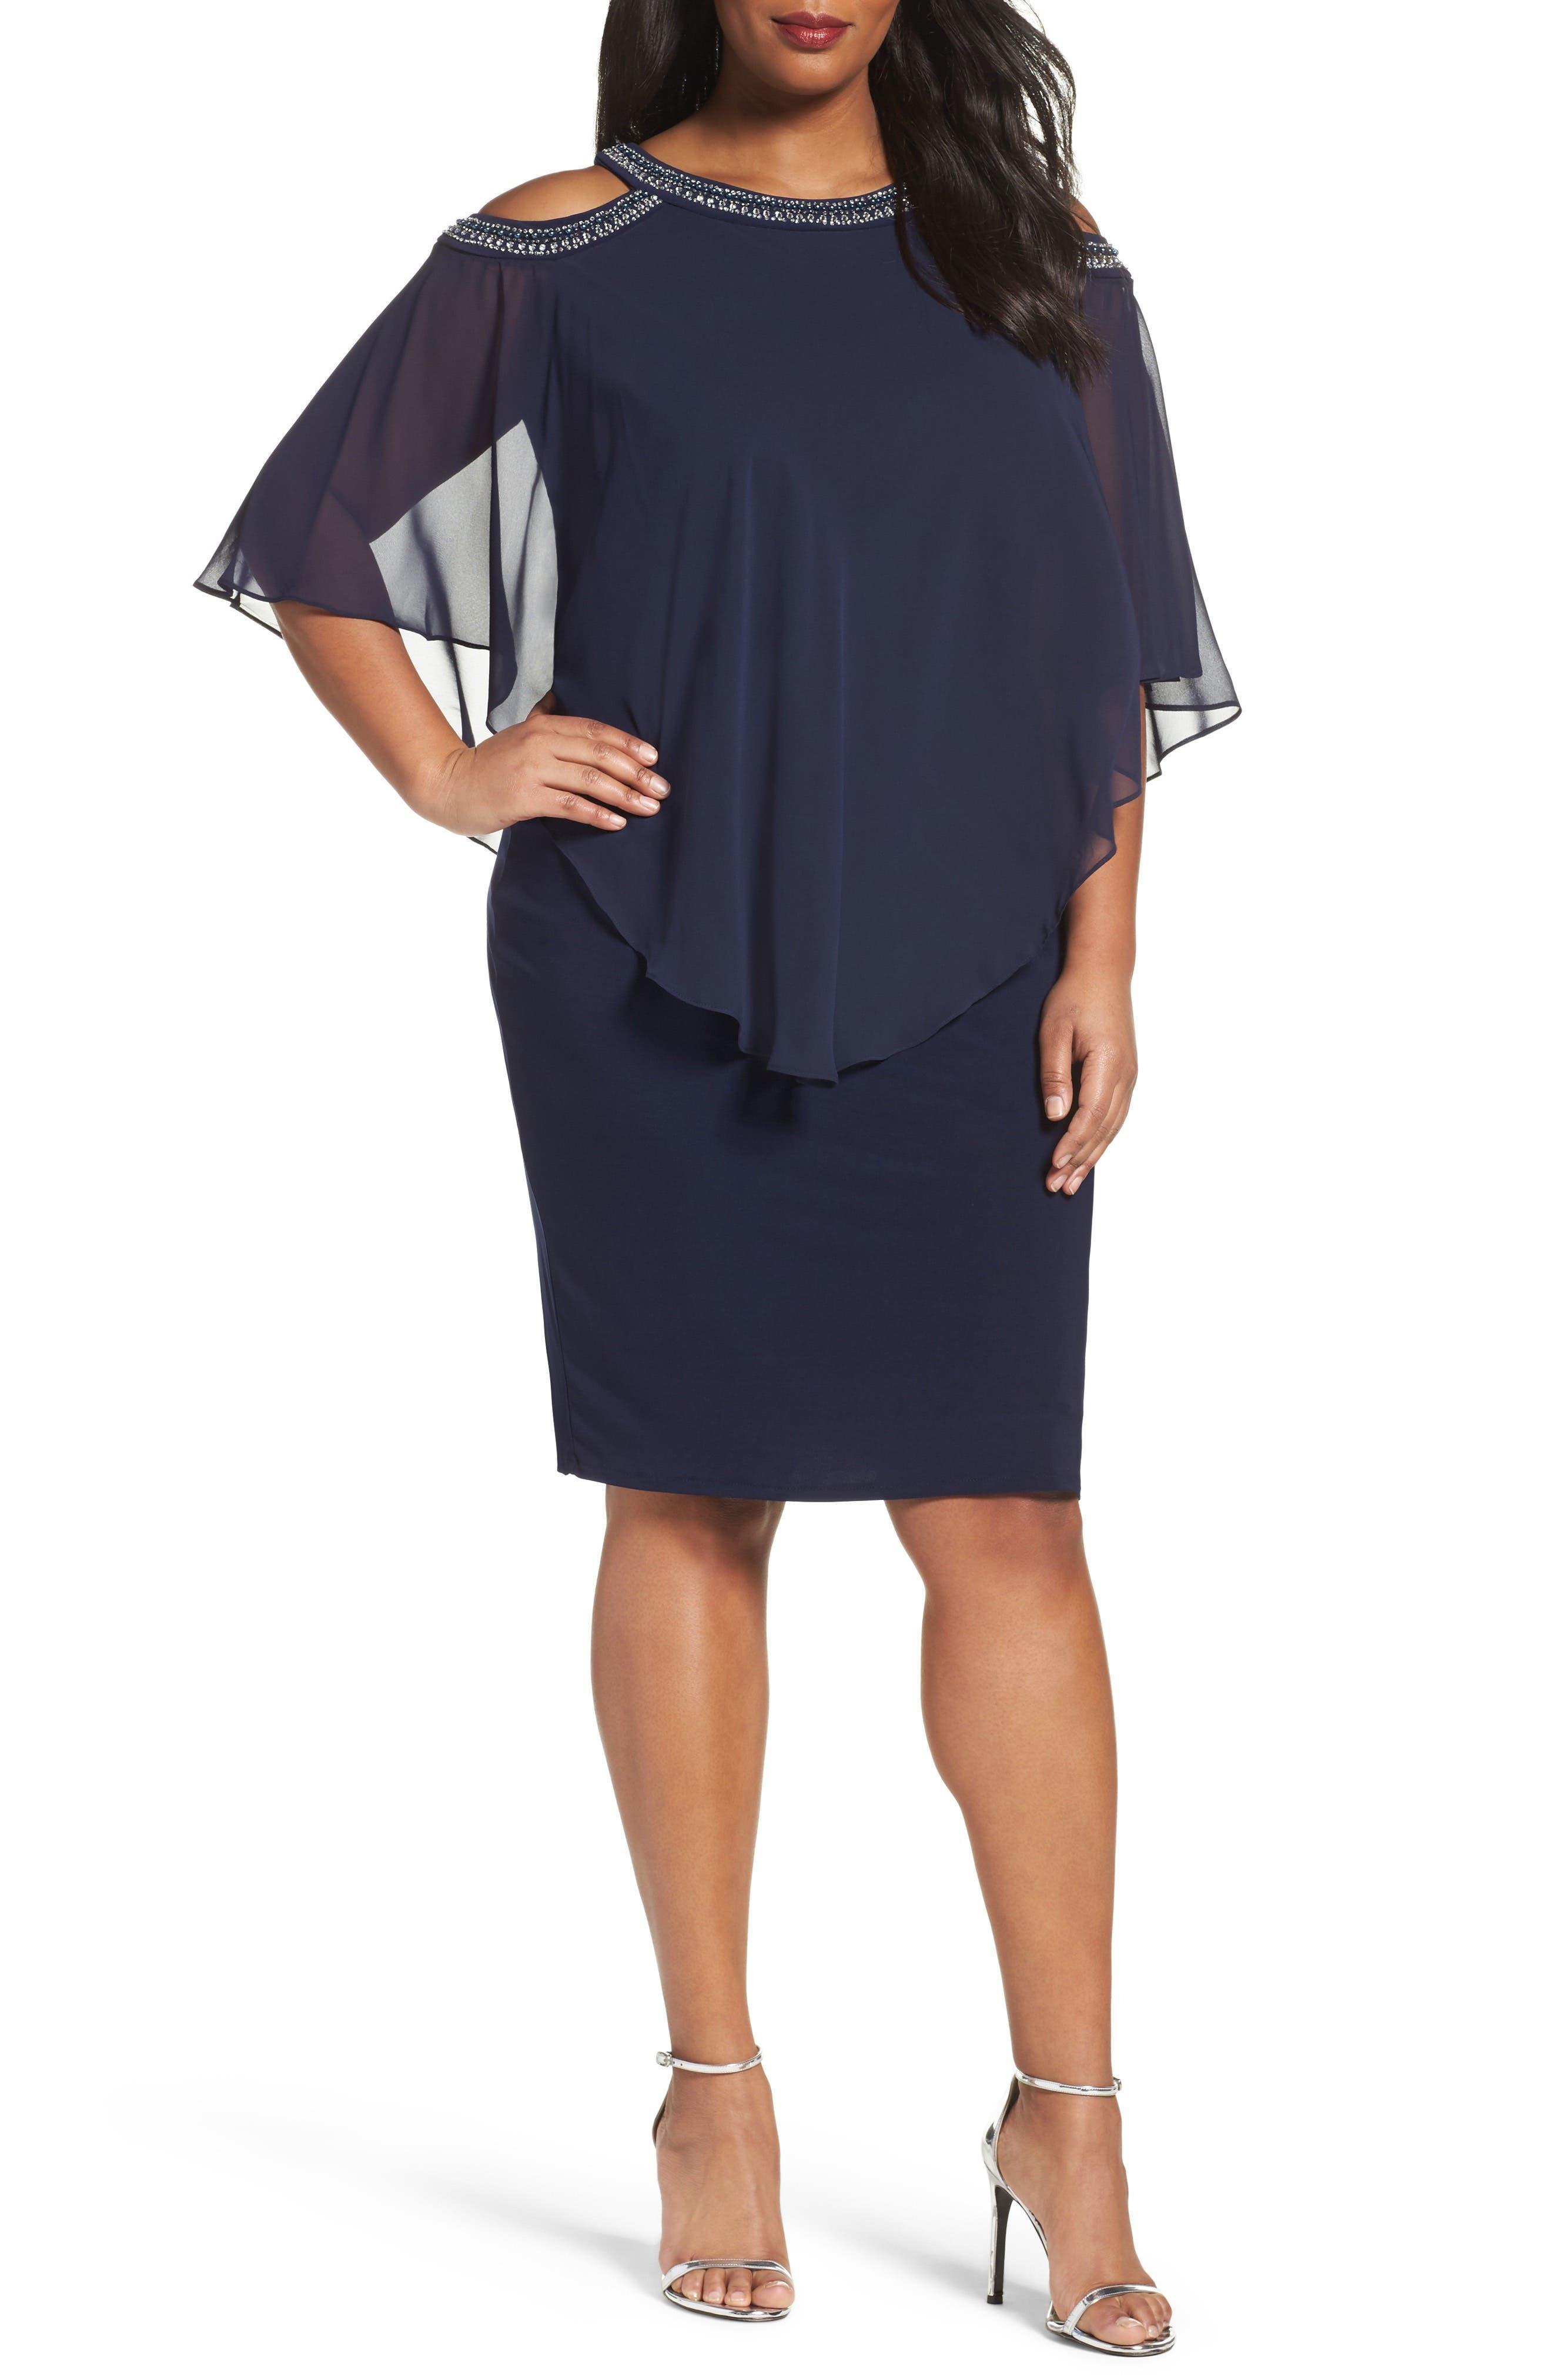 Cocktail Dresses for Plus Size